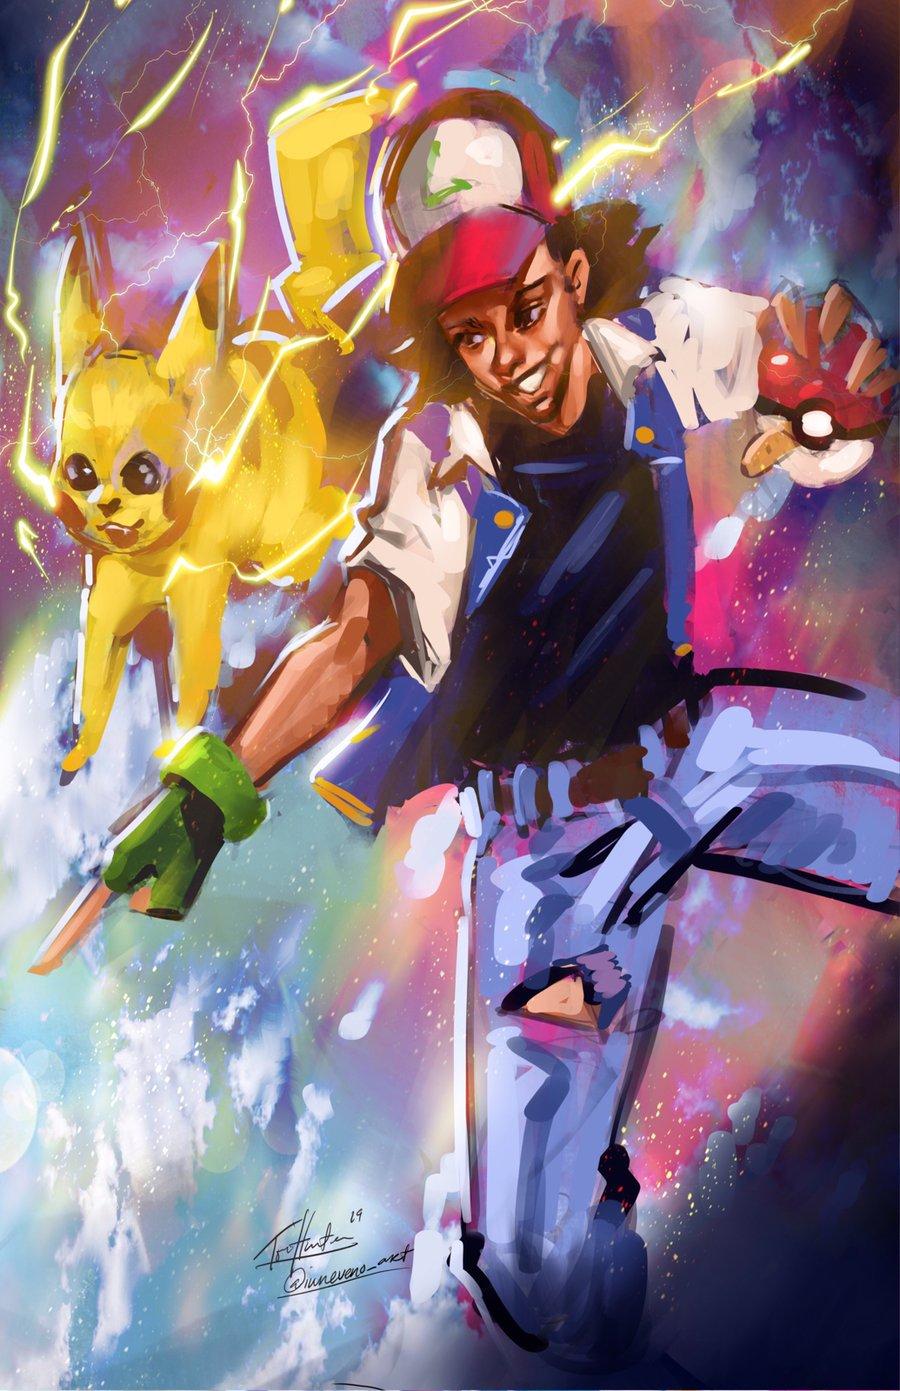 Image of Ash and Pikachu